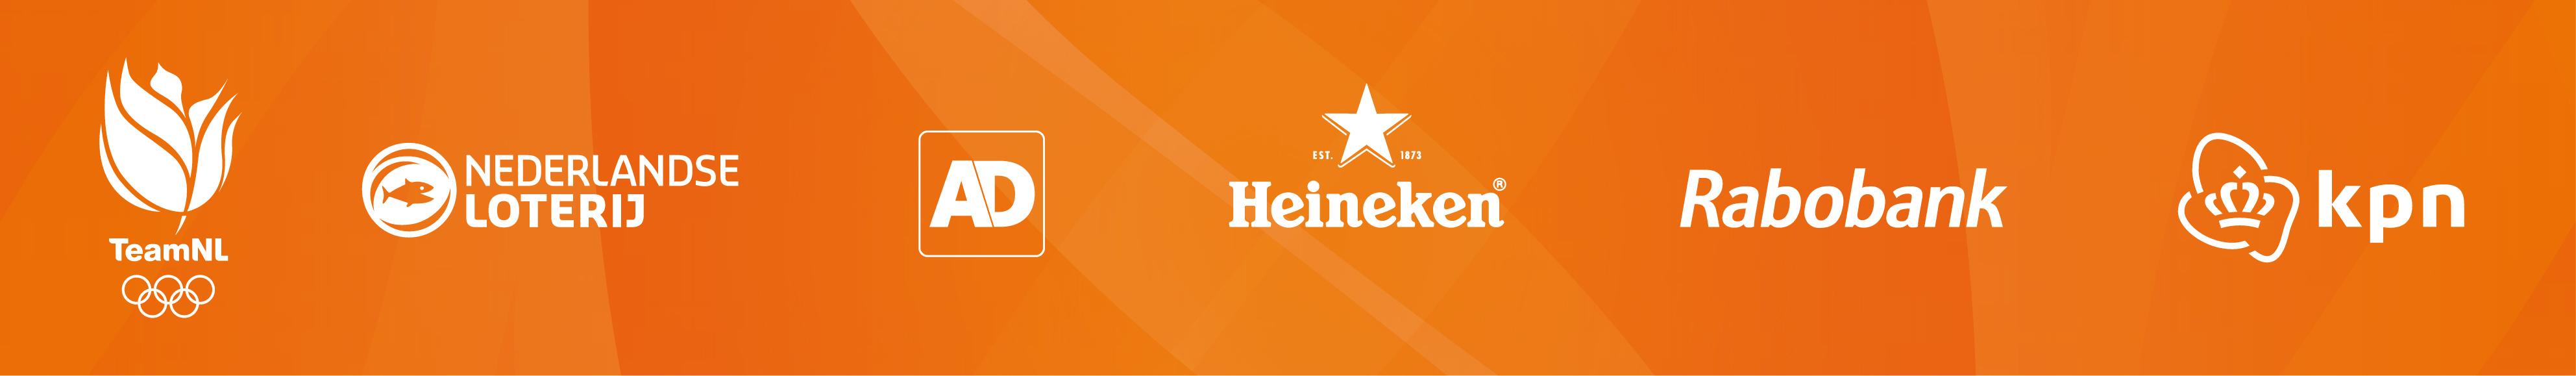 Banner Team NL